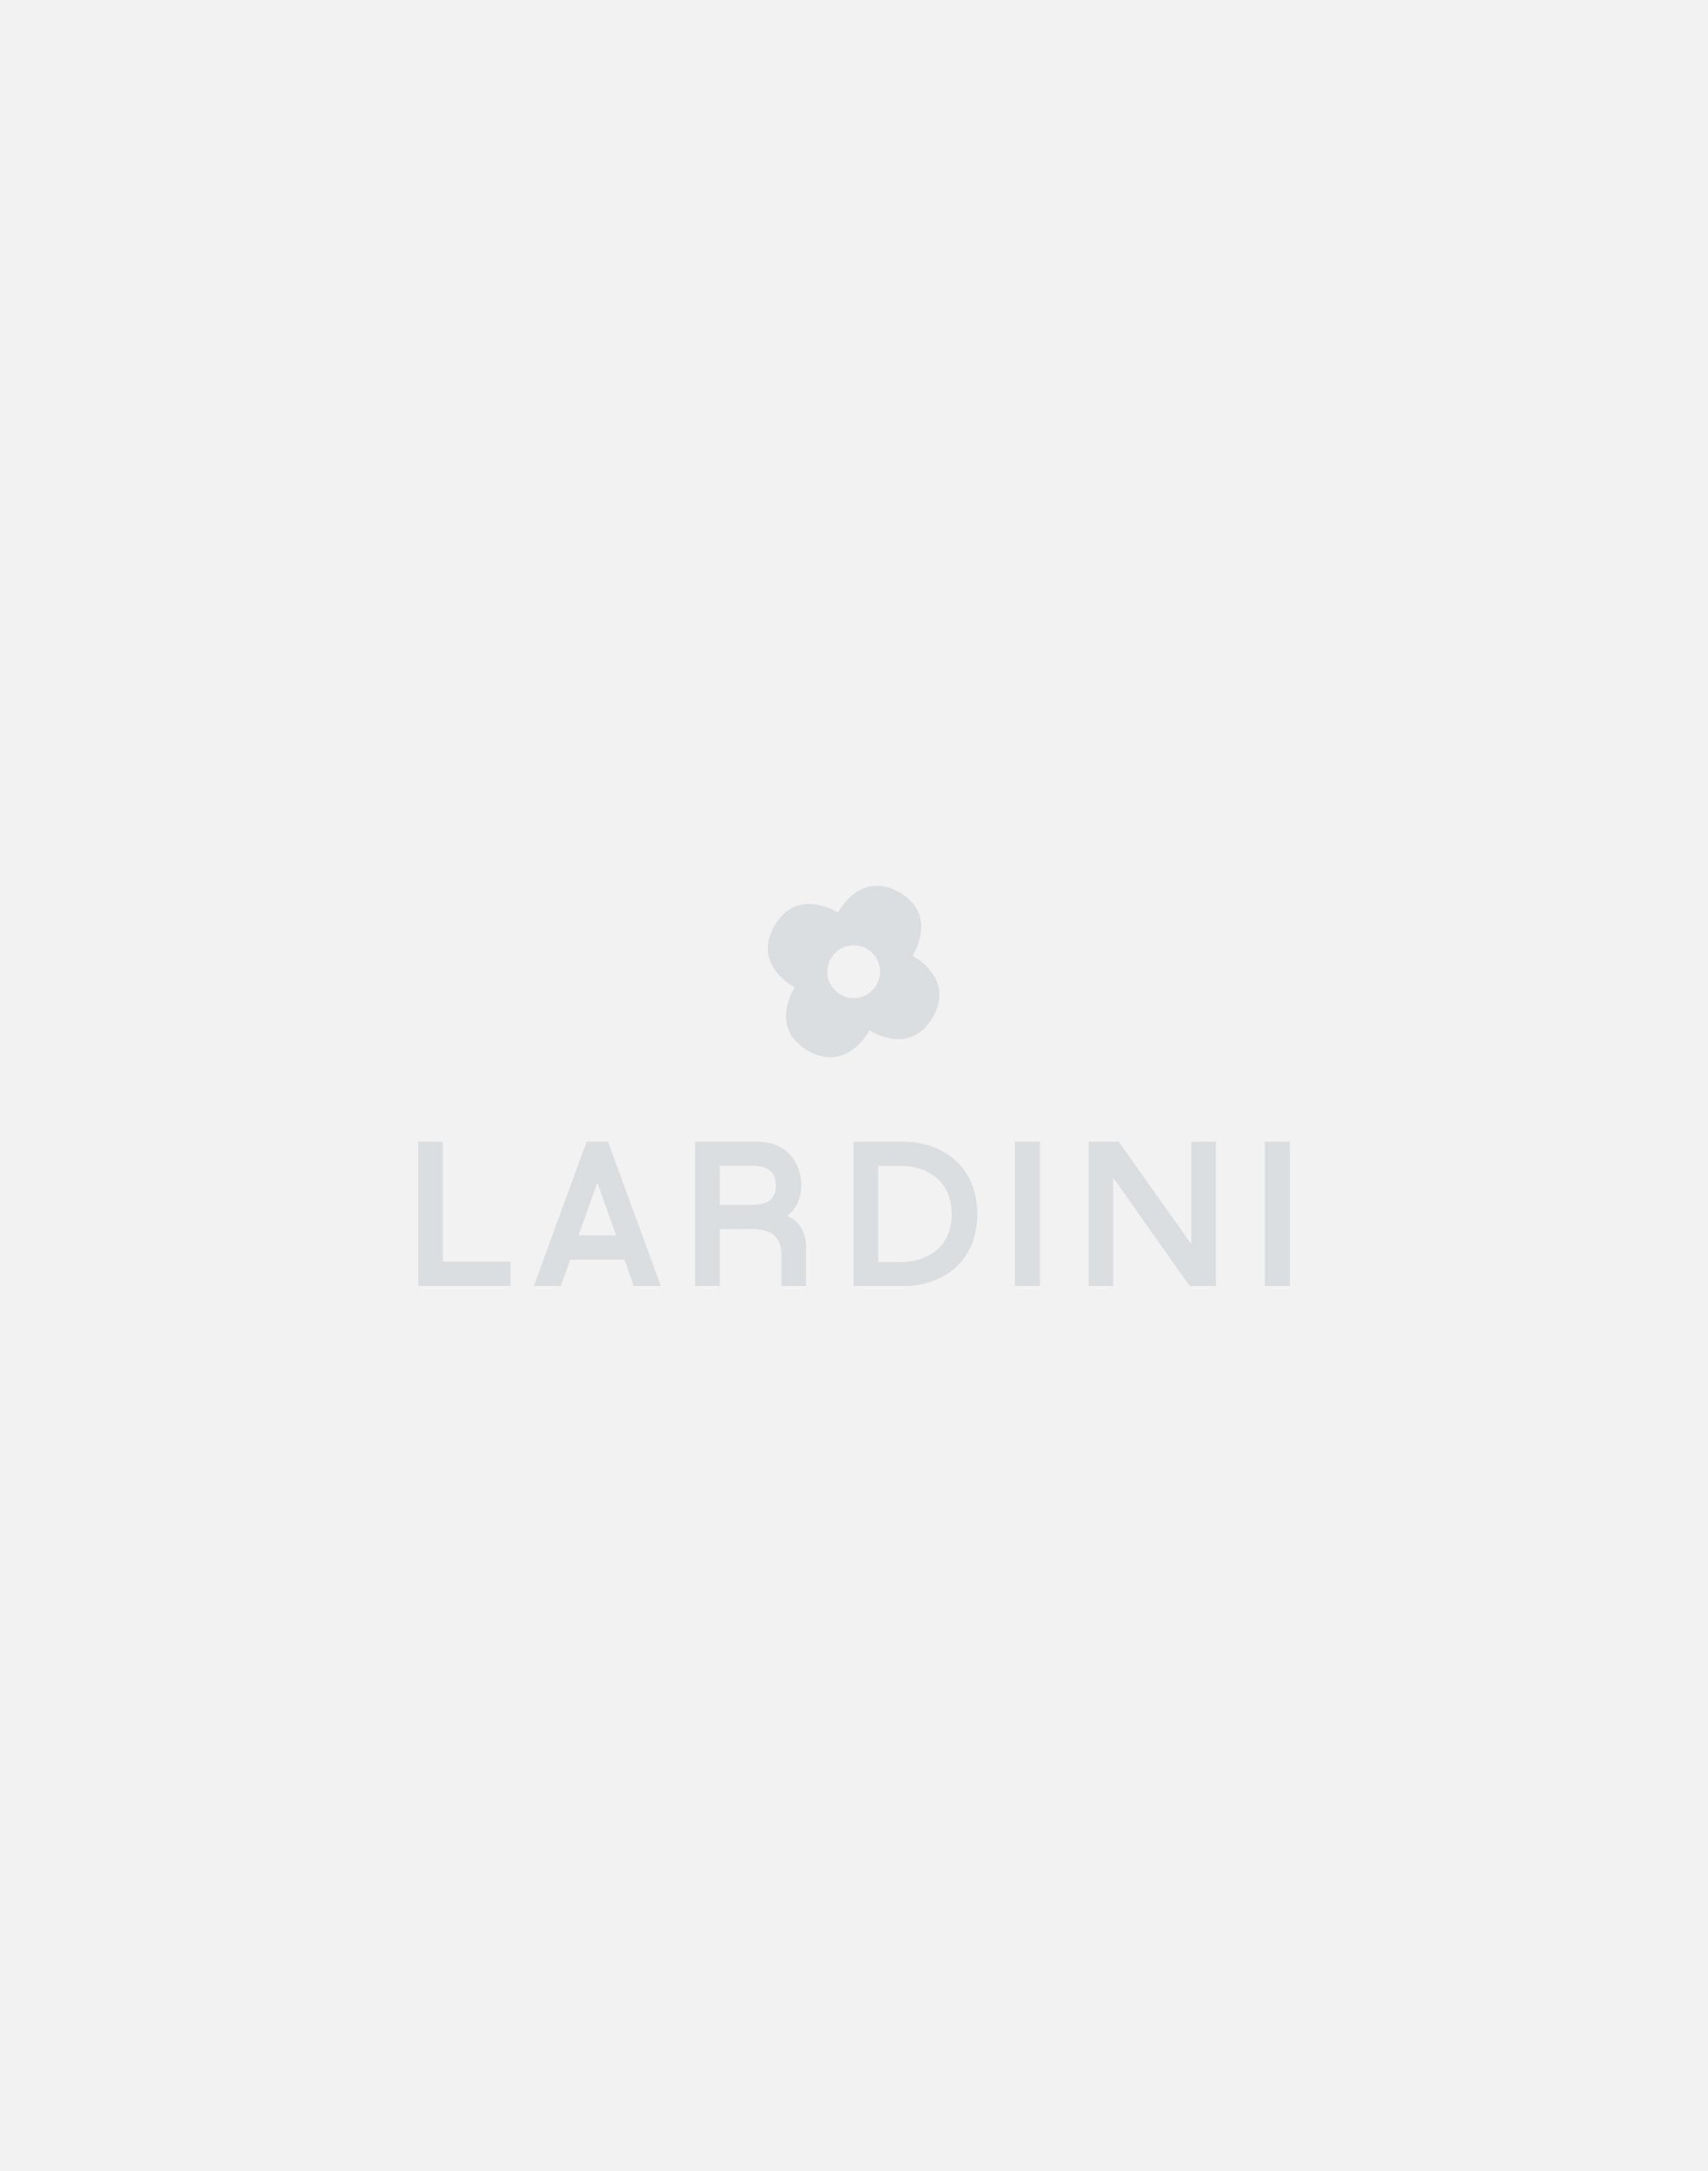 Burgundy cotton polo shirt - Luigi Lardini capsule